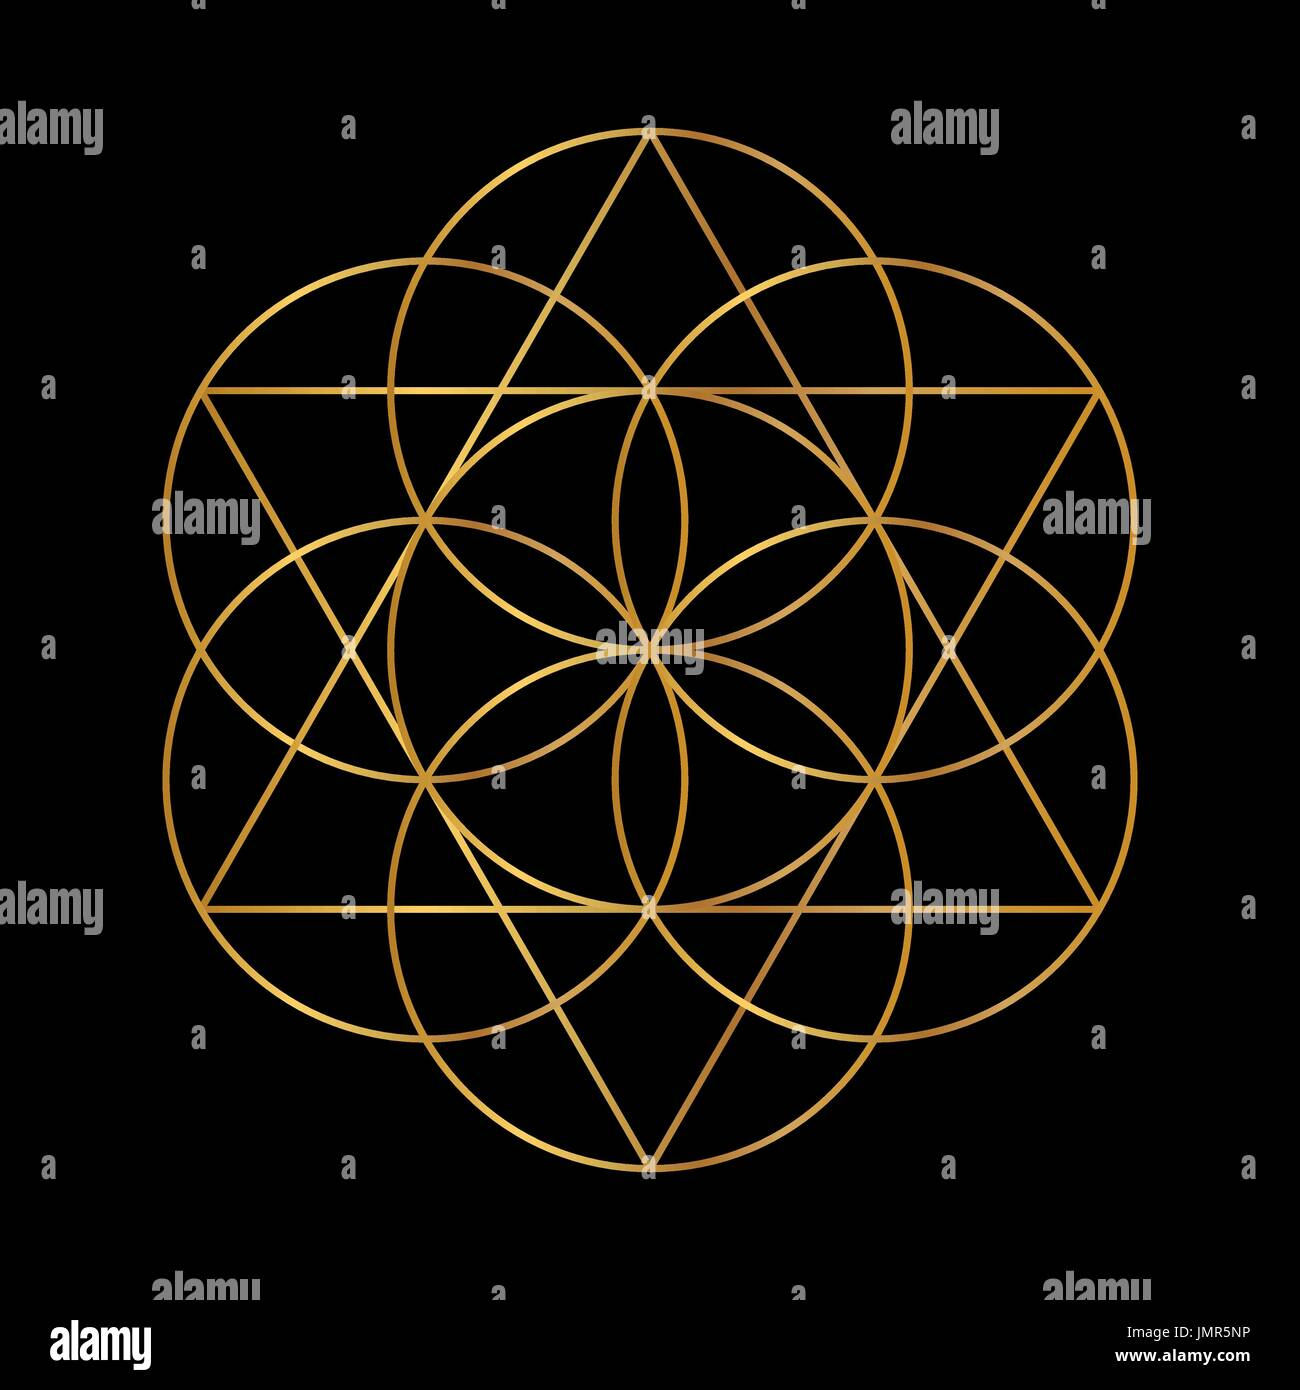 sacred geometry vector vectors stock photos sacred geometry vector